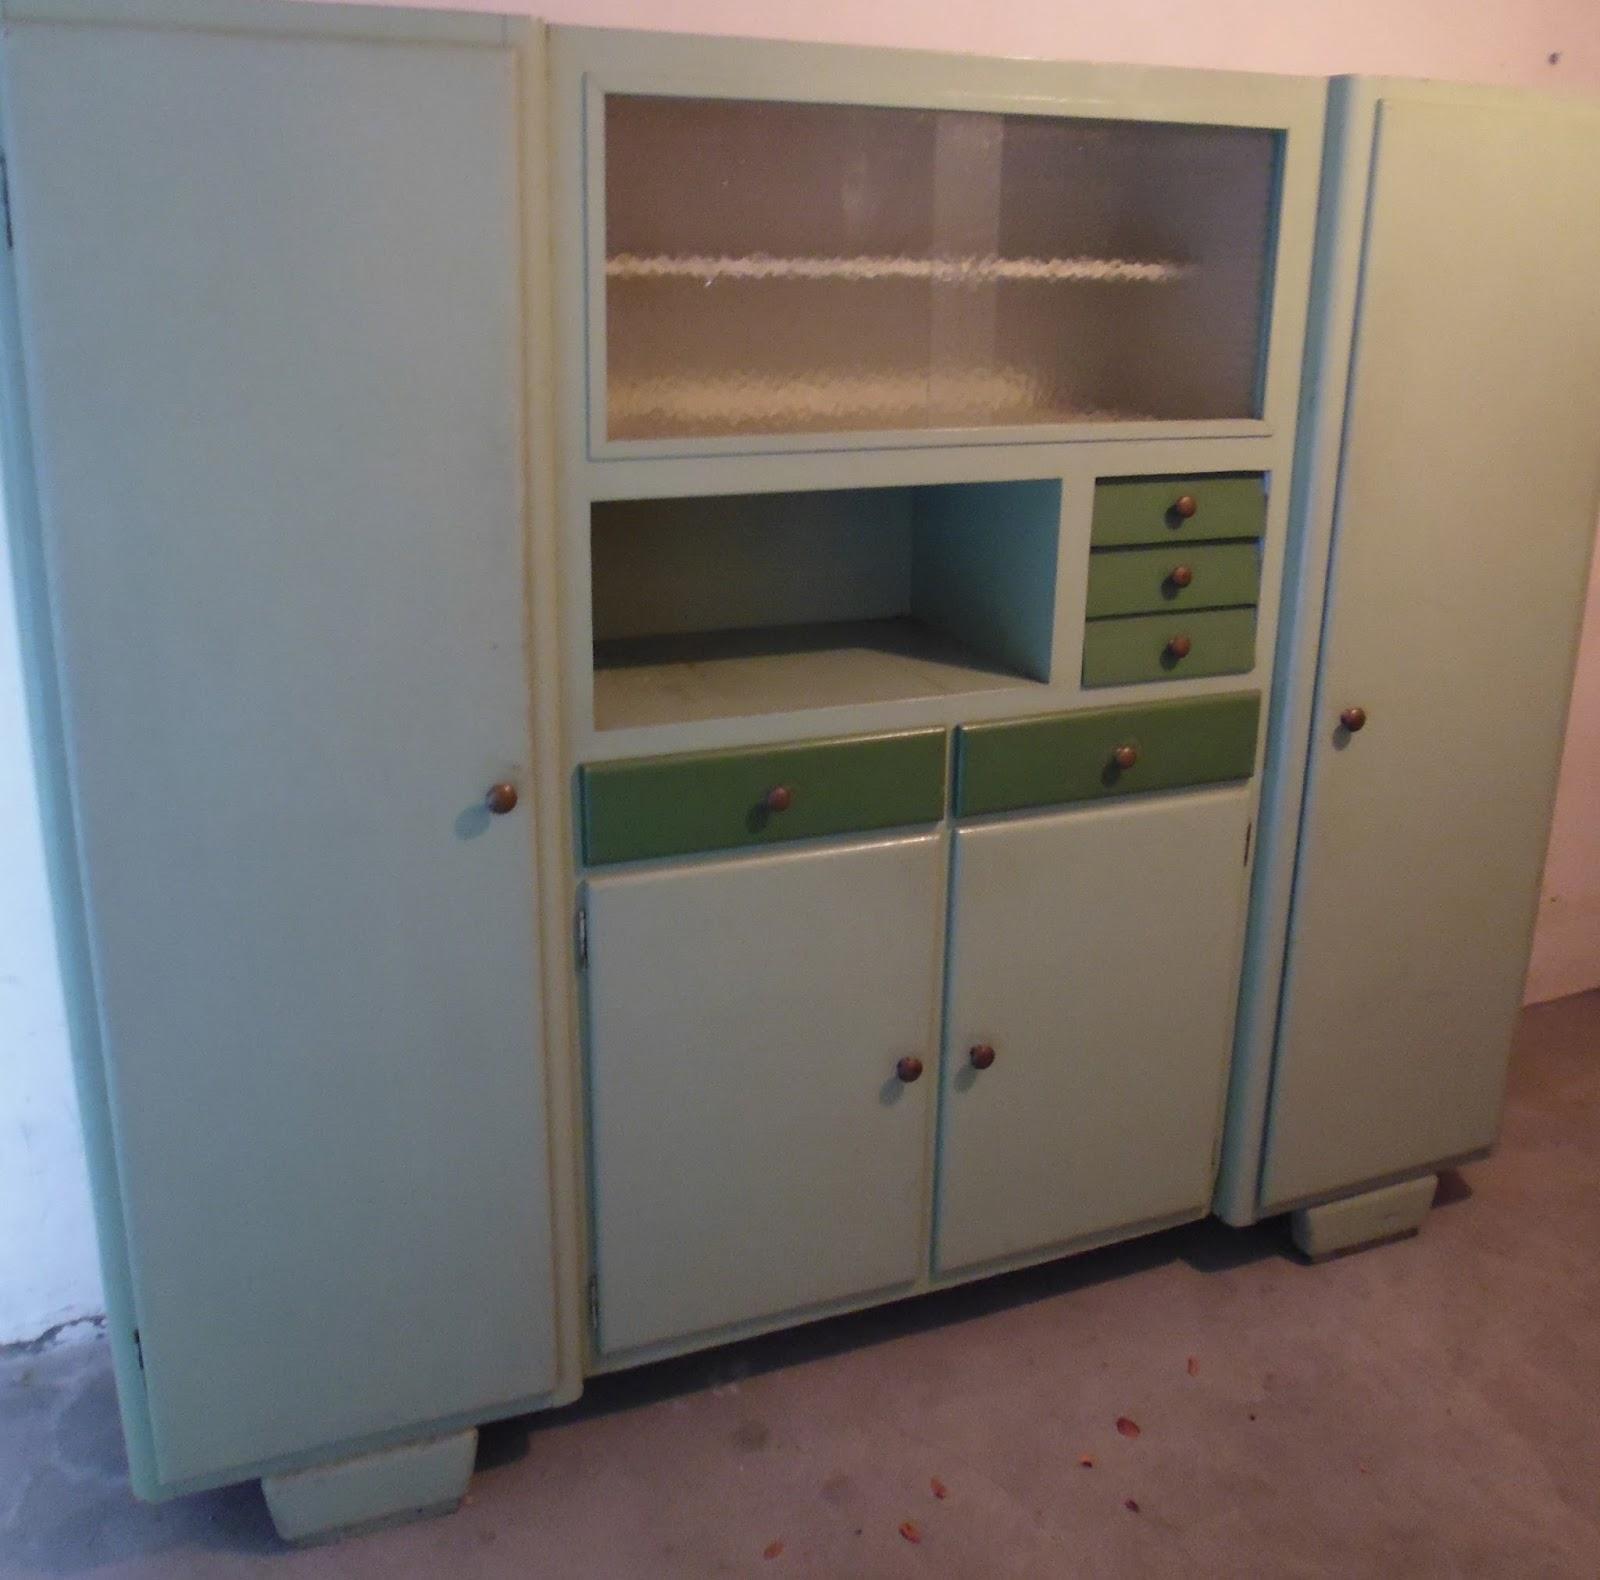 rimodern Credenza da cucina vintage anni 50 60